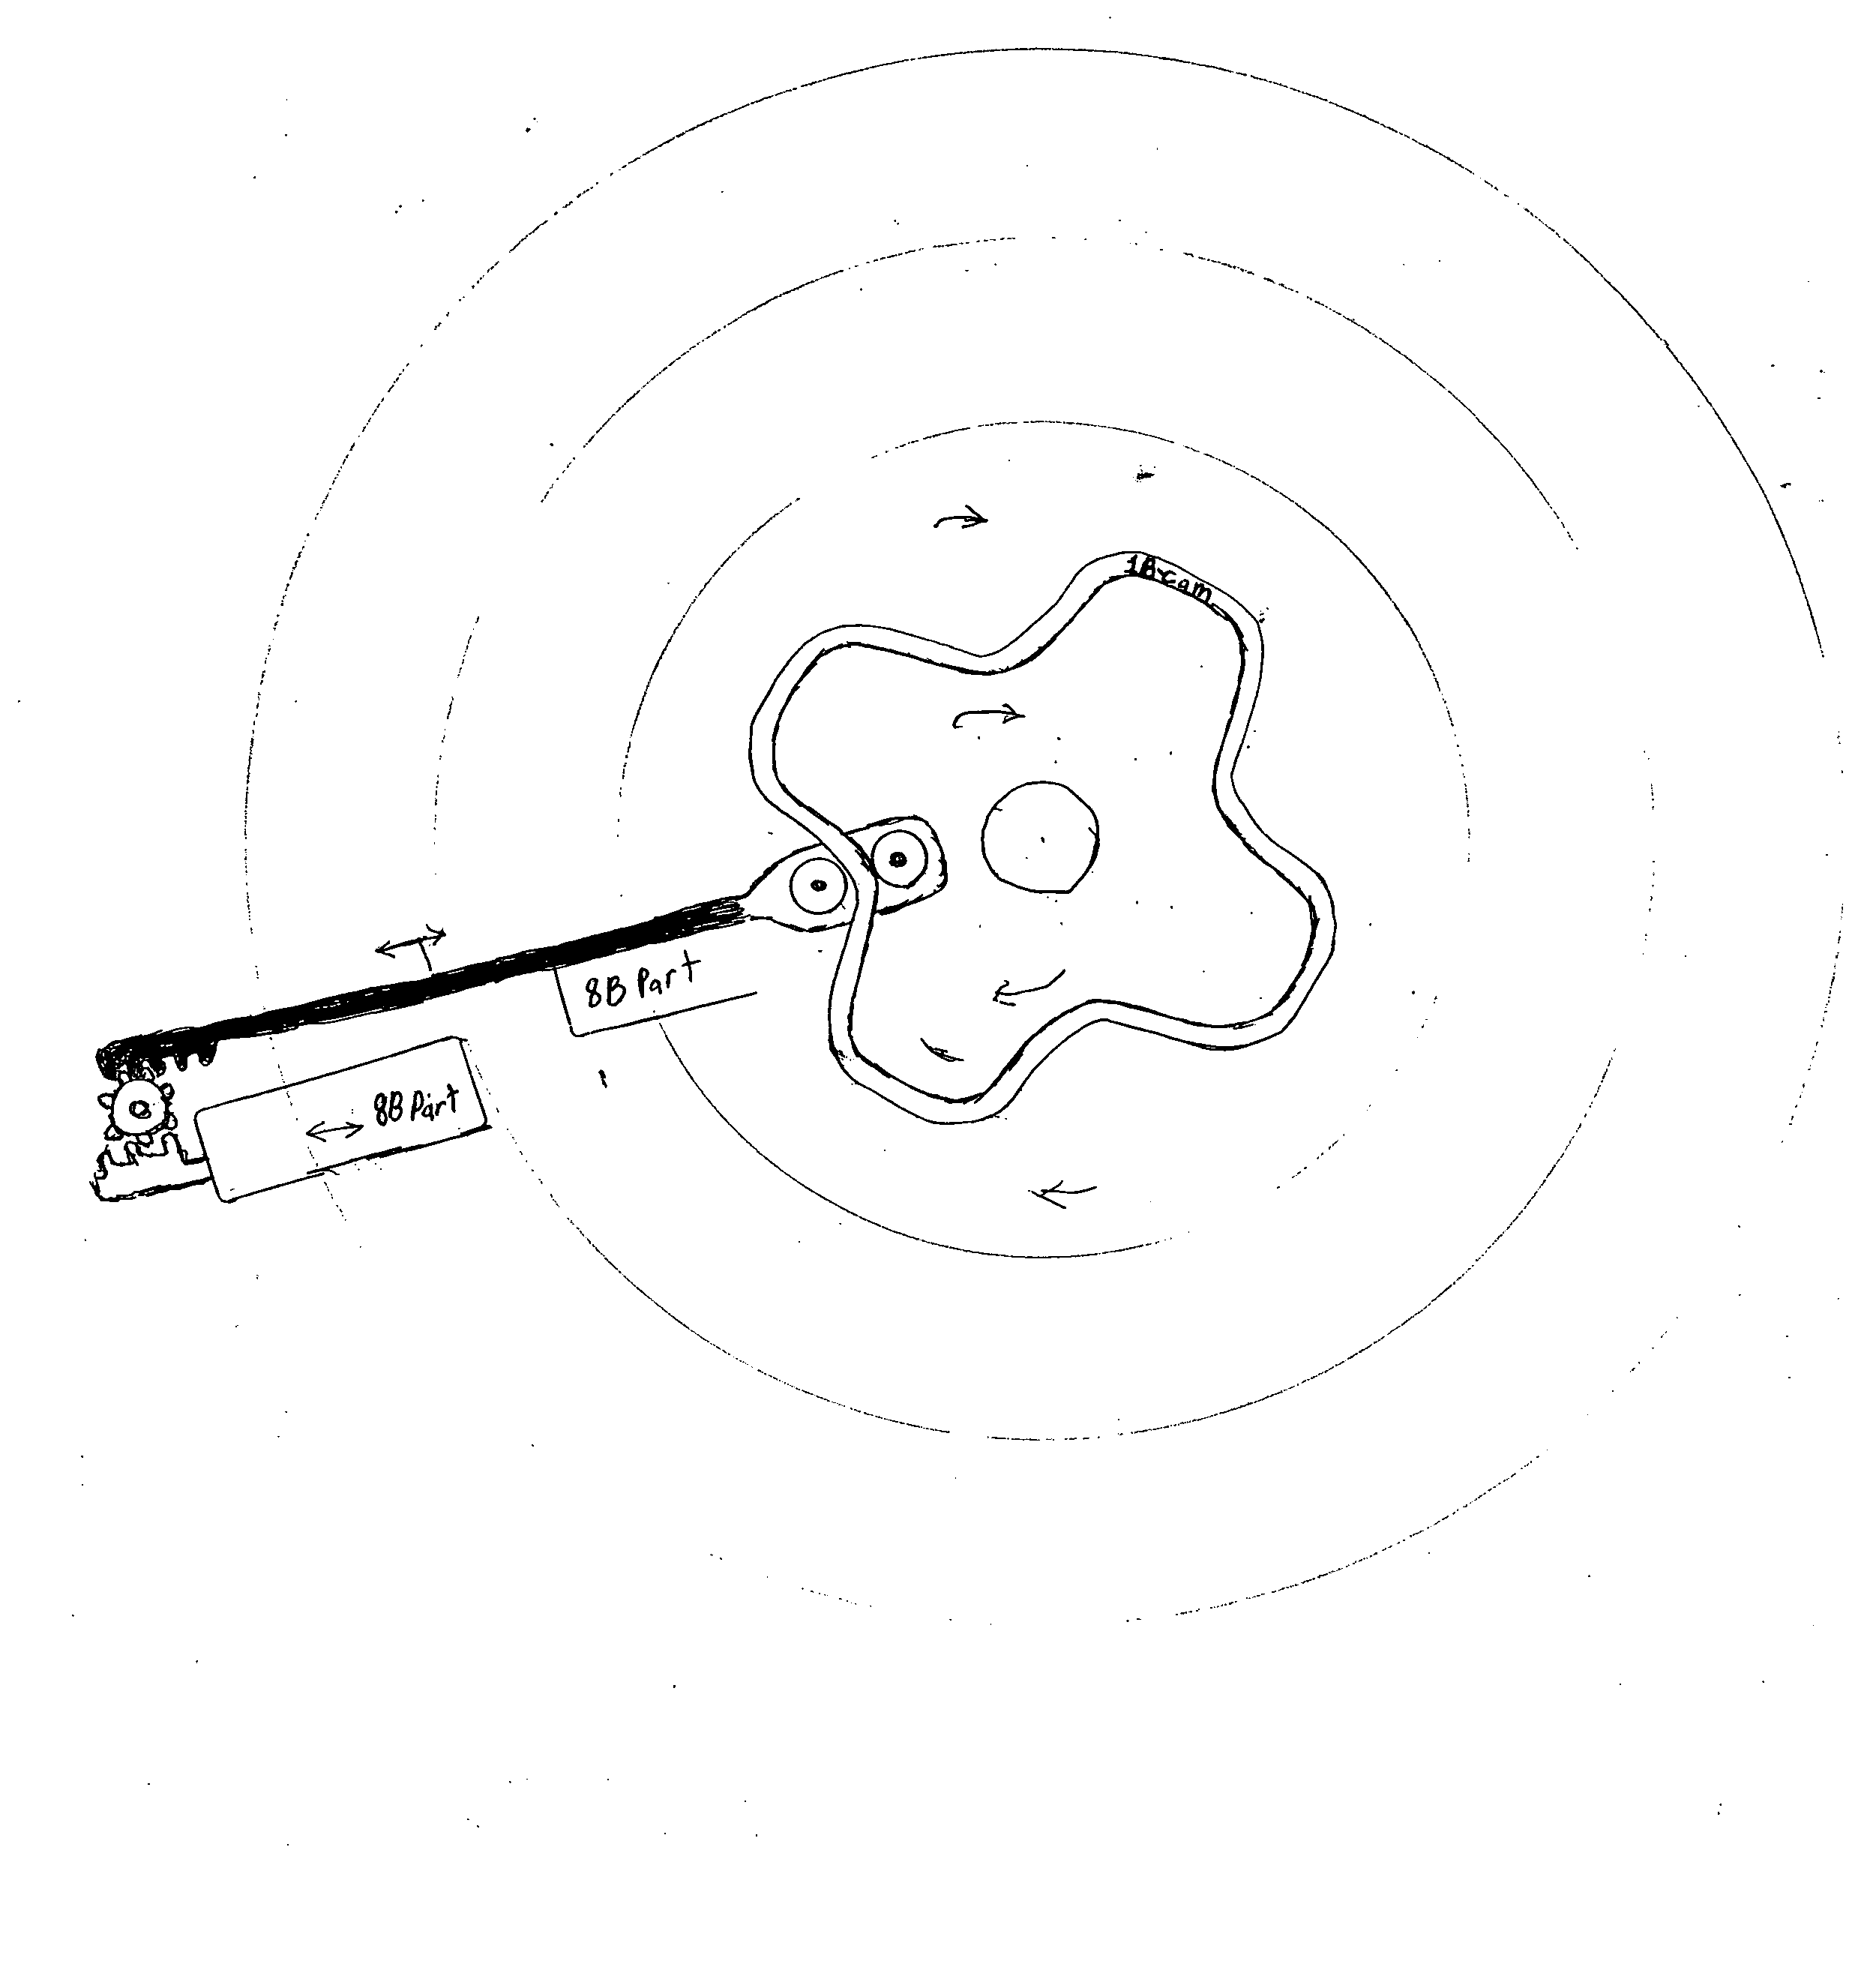 Patent US20070246939 - Perpetual motion machine - Google Patents